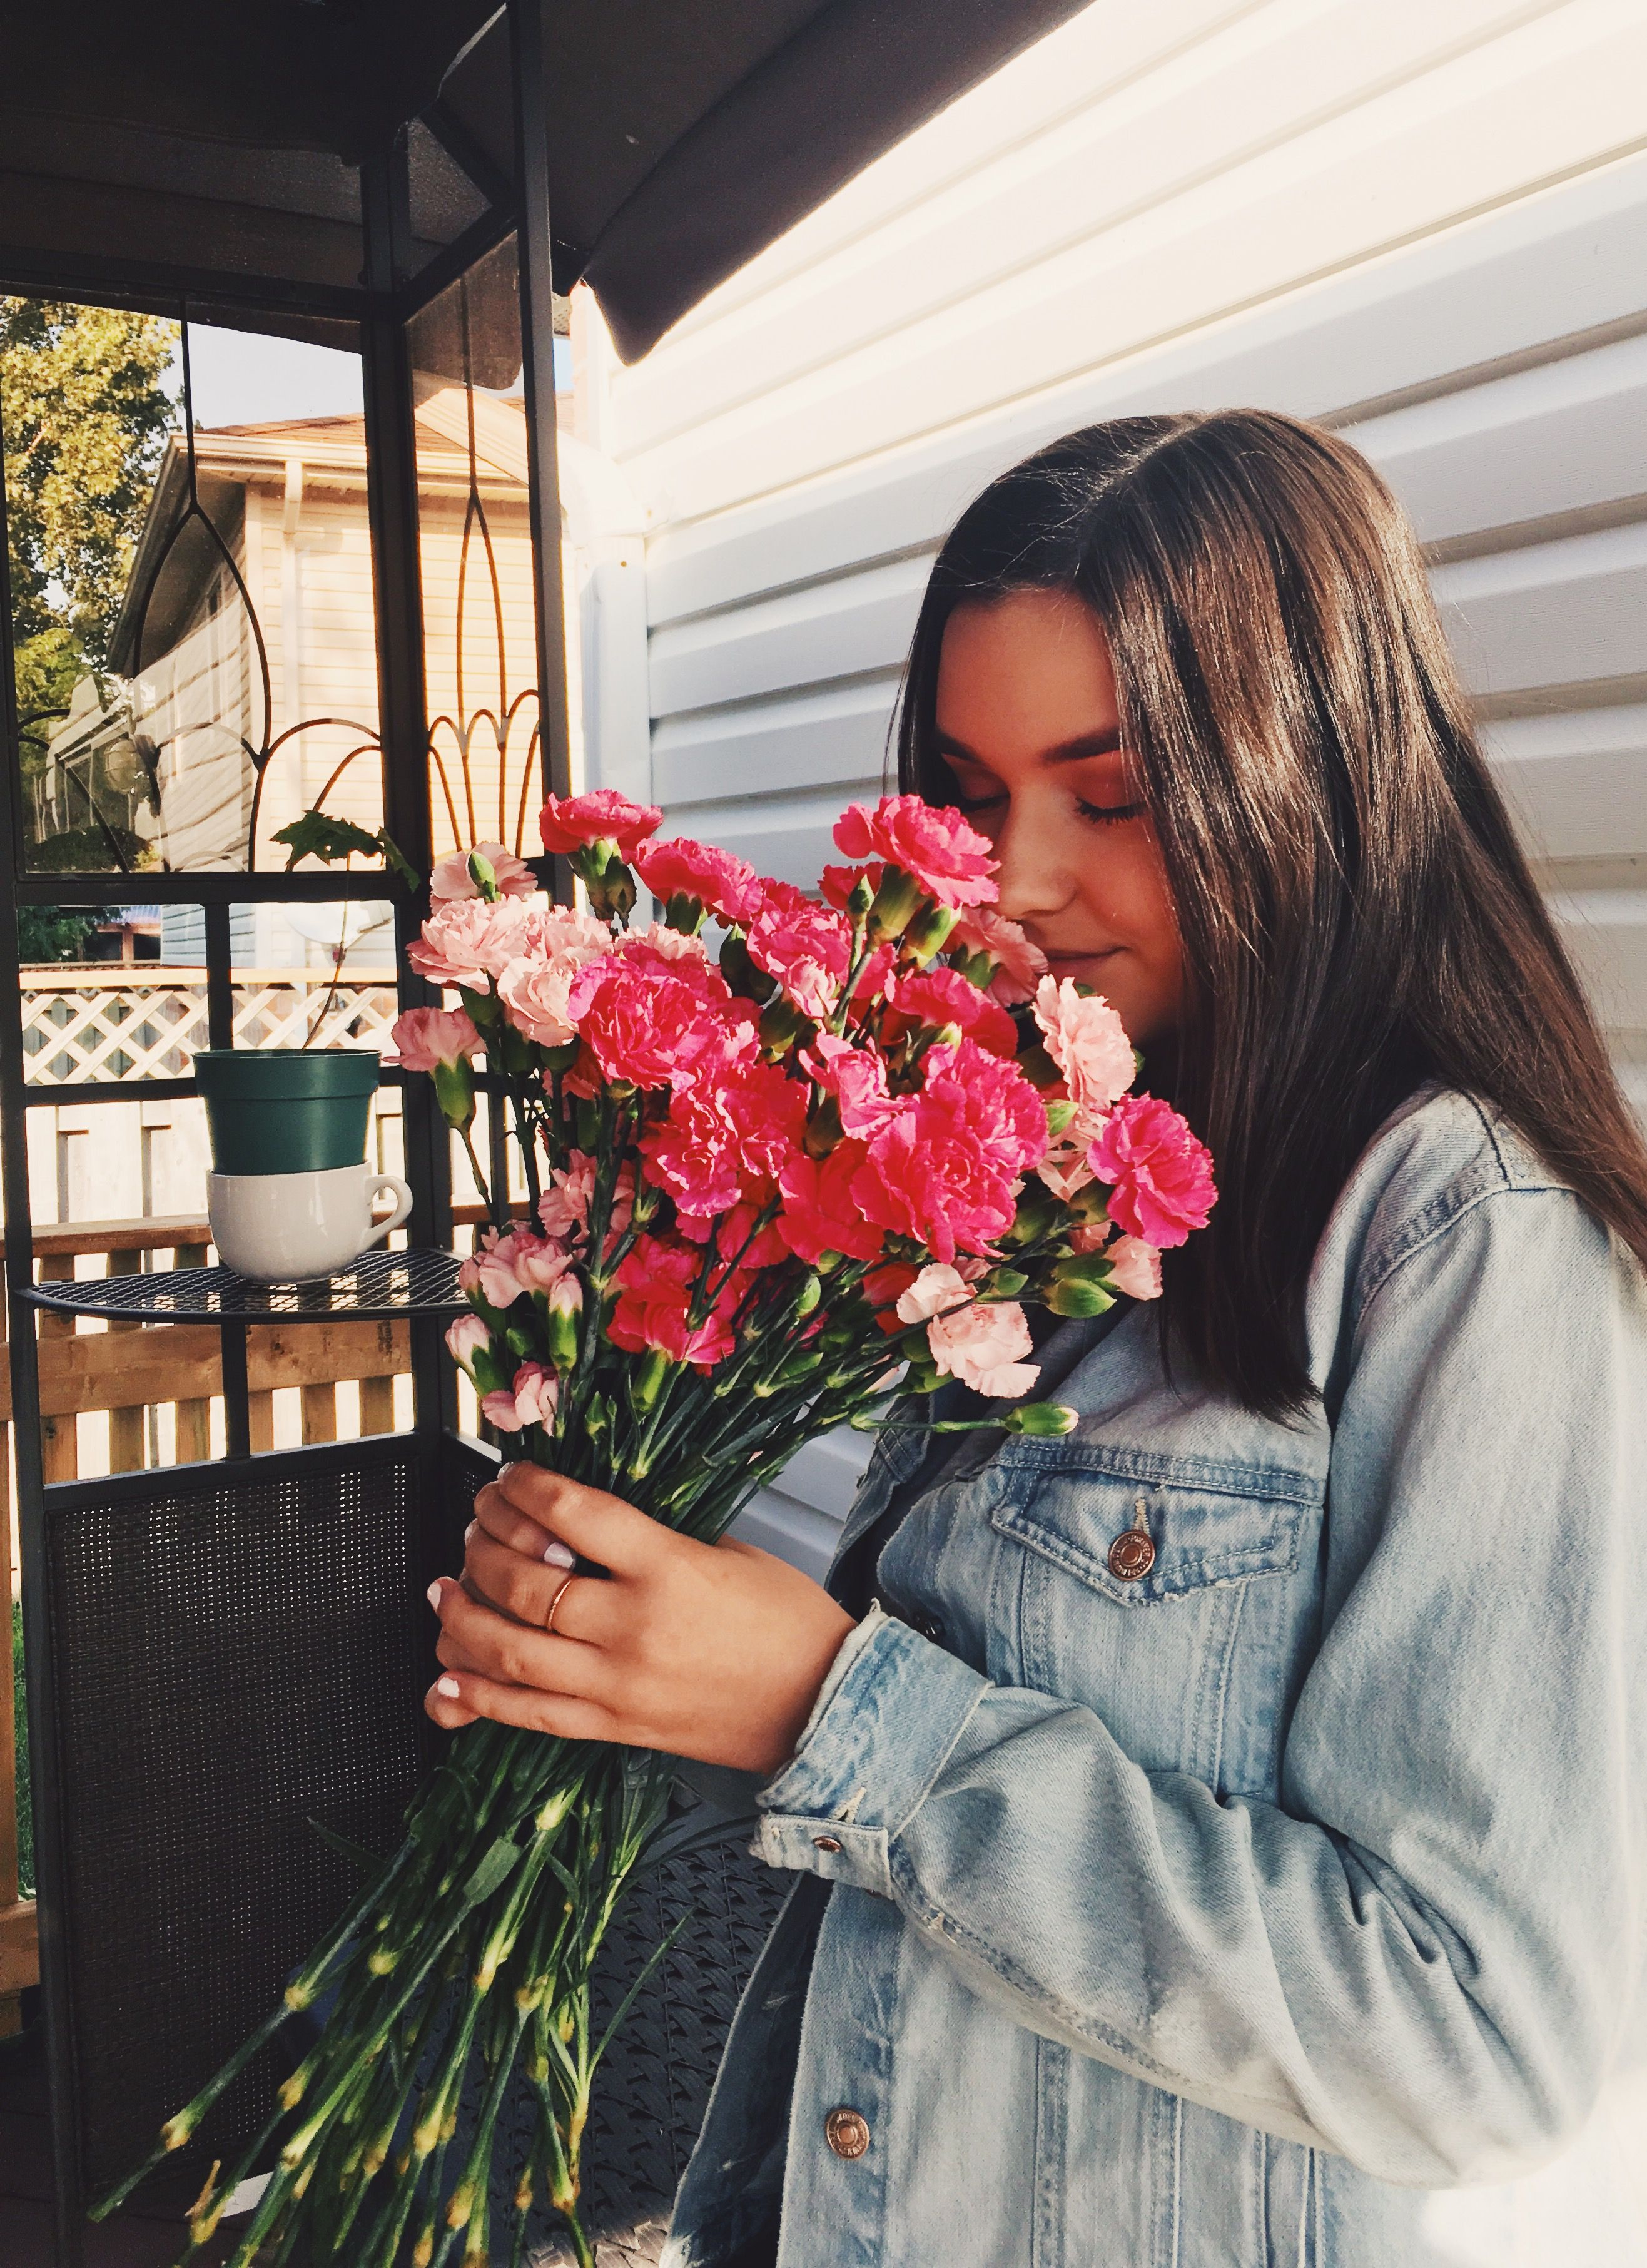 Брюнетка с цветами картинка